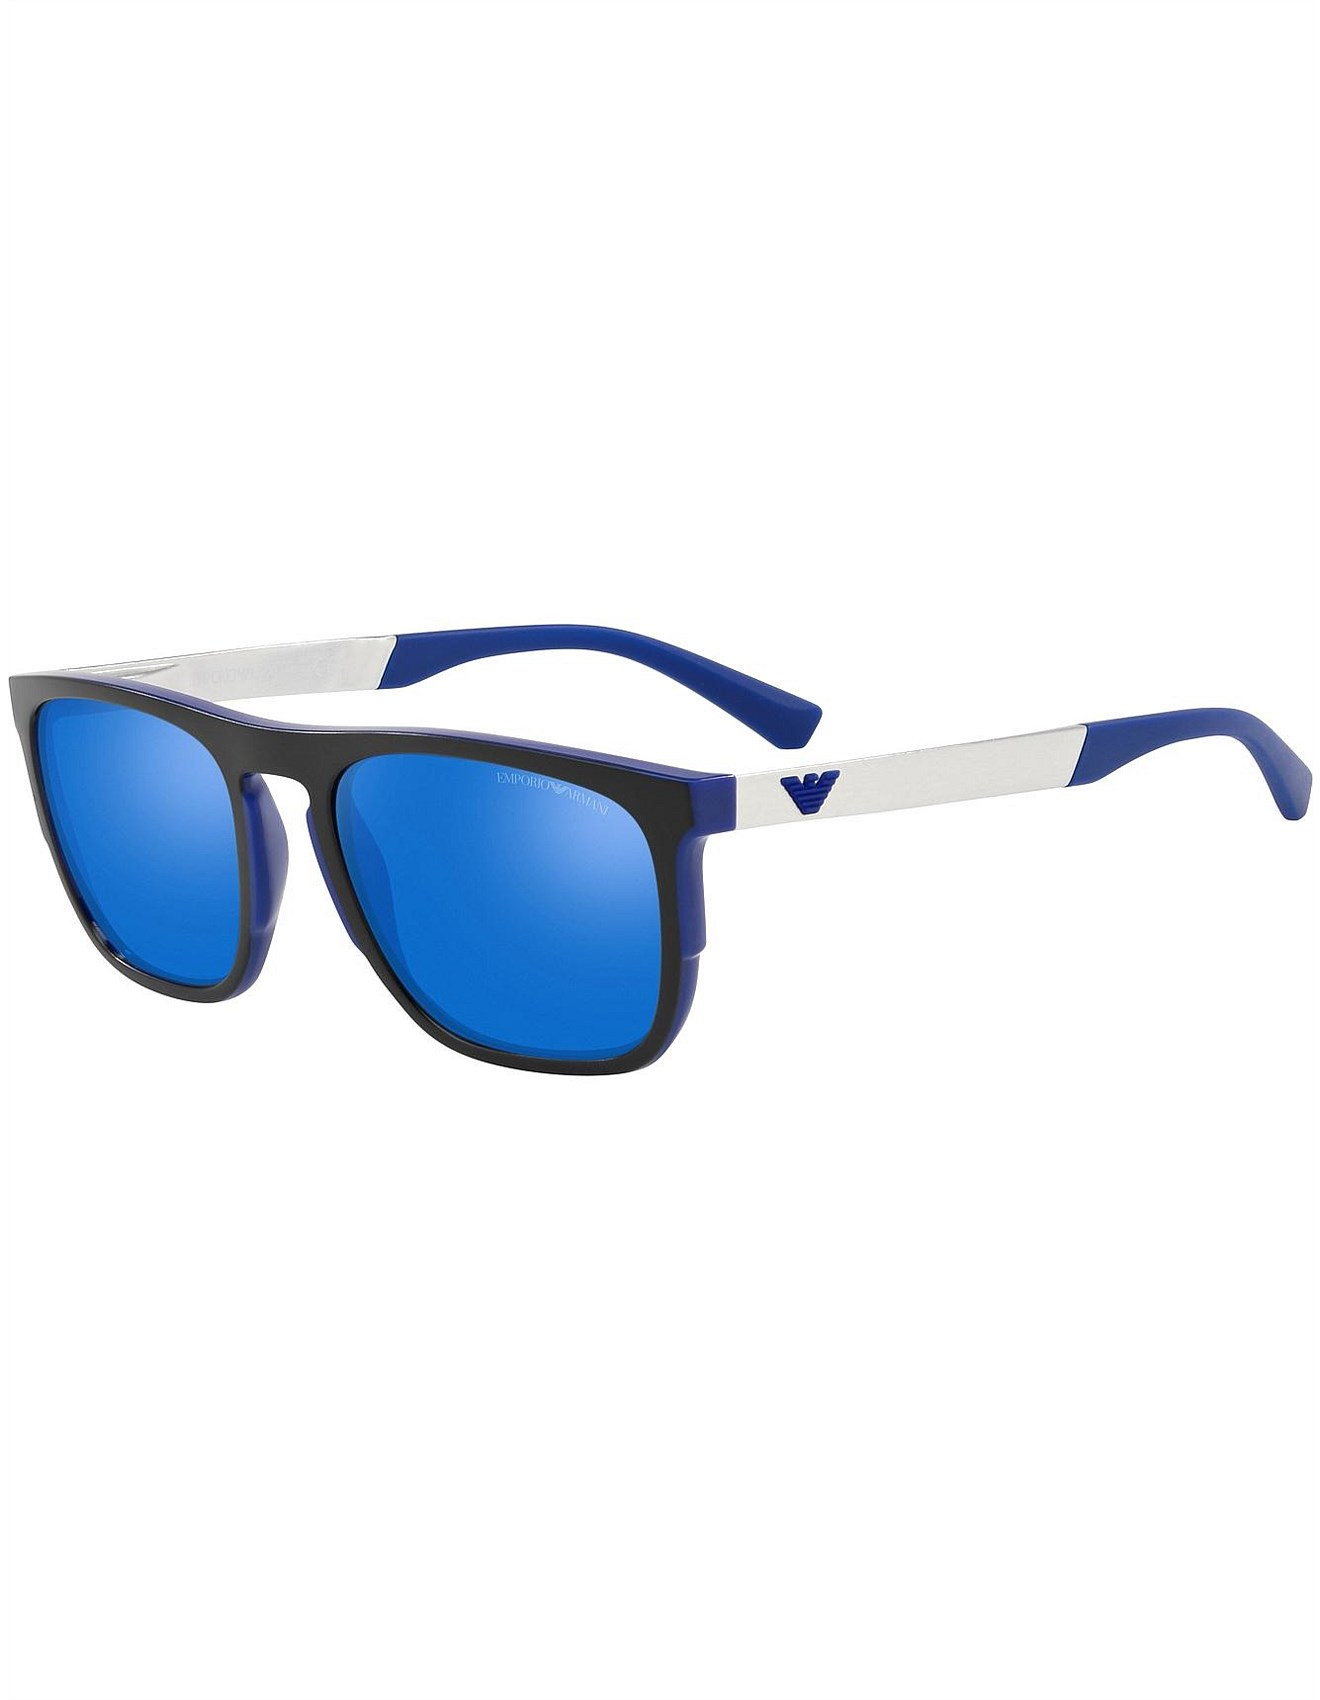 b95fbfbde22a Men s Square Sunglasses